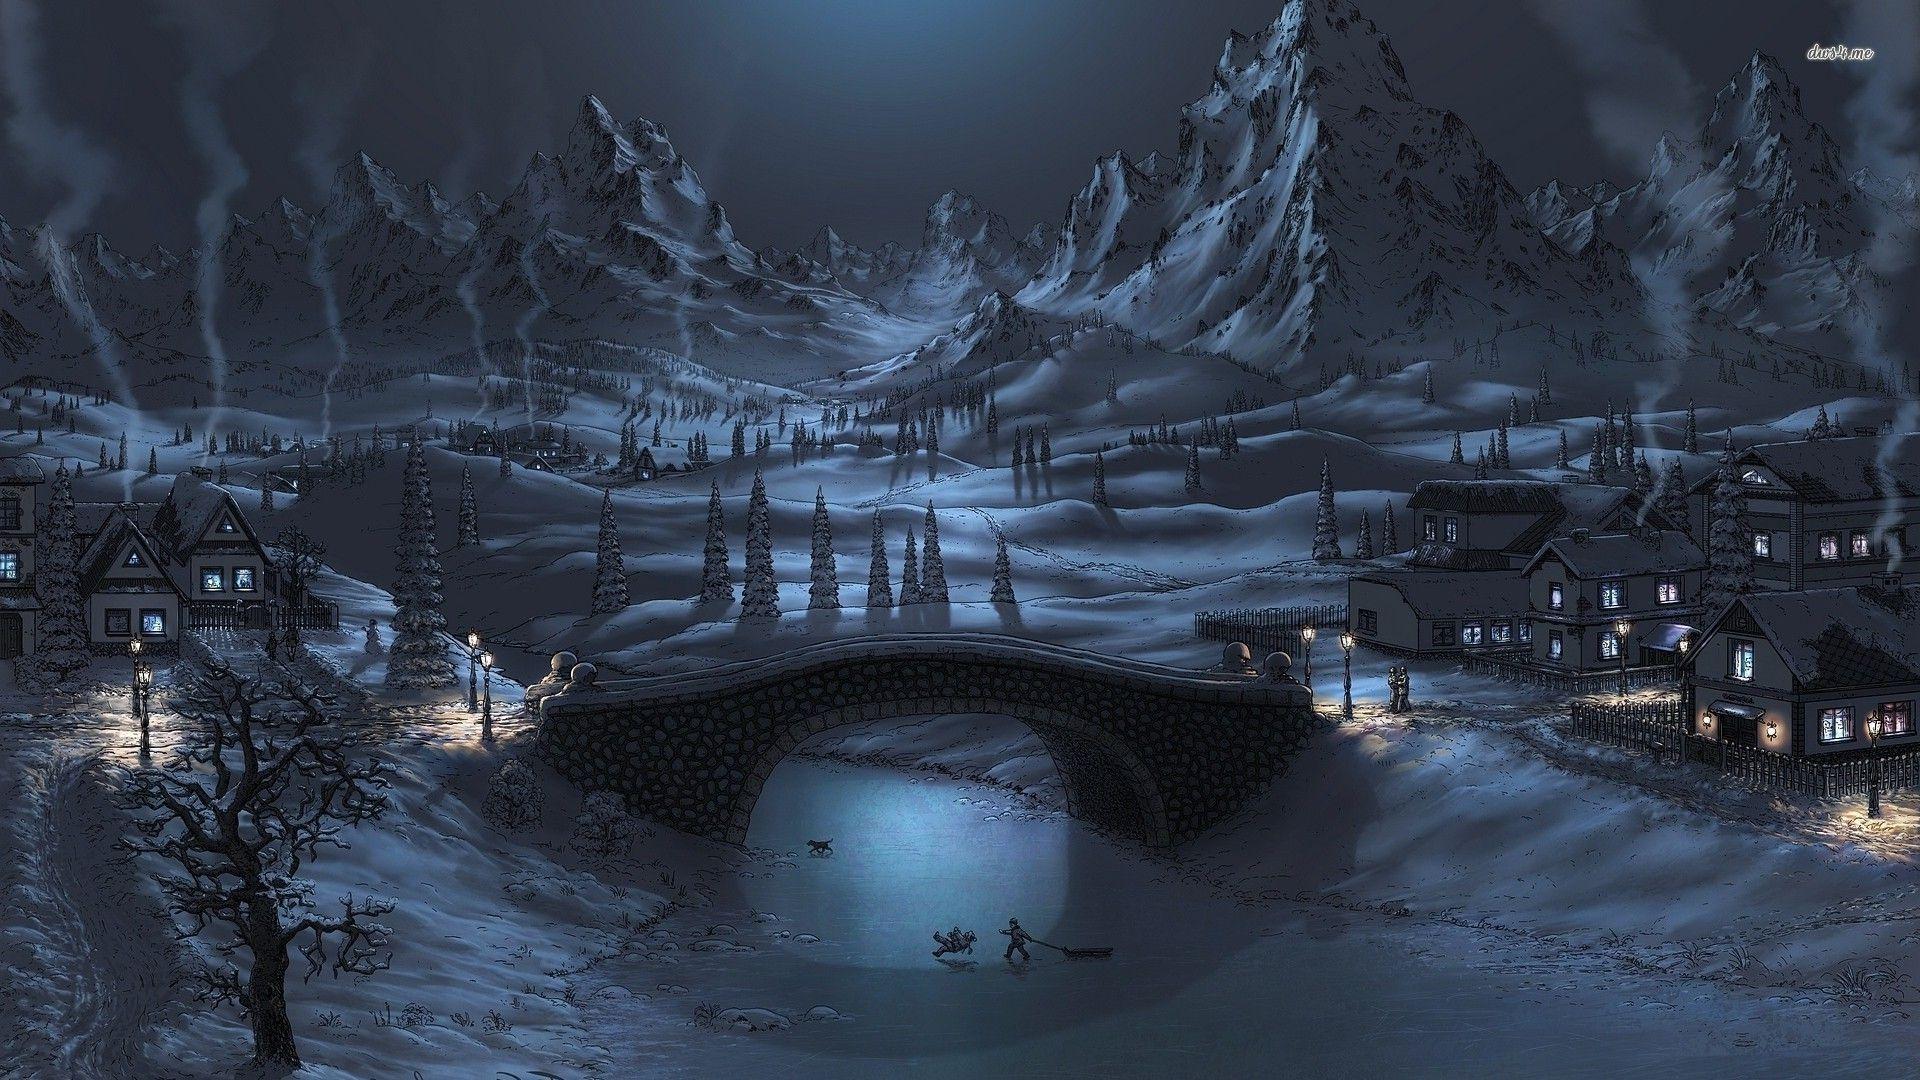 Winter Night, 1920x1080 Maud Meder Paysage hiver, Nuit d